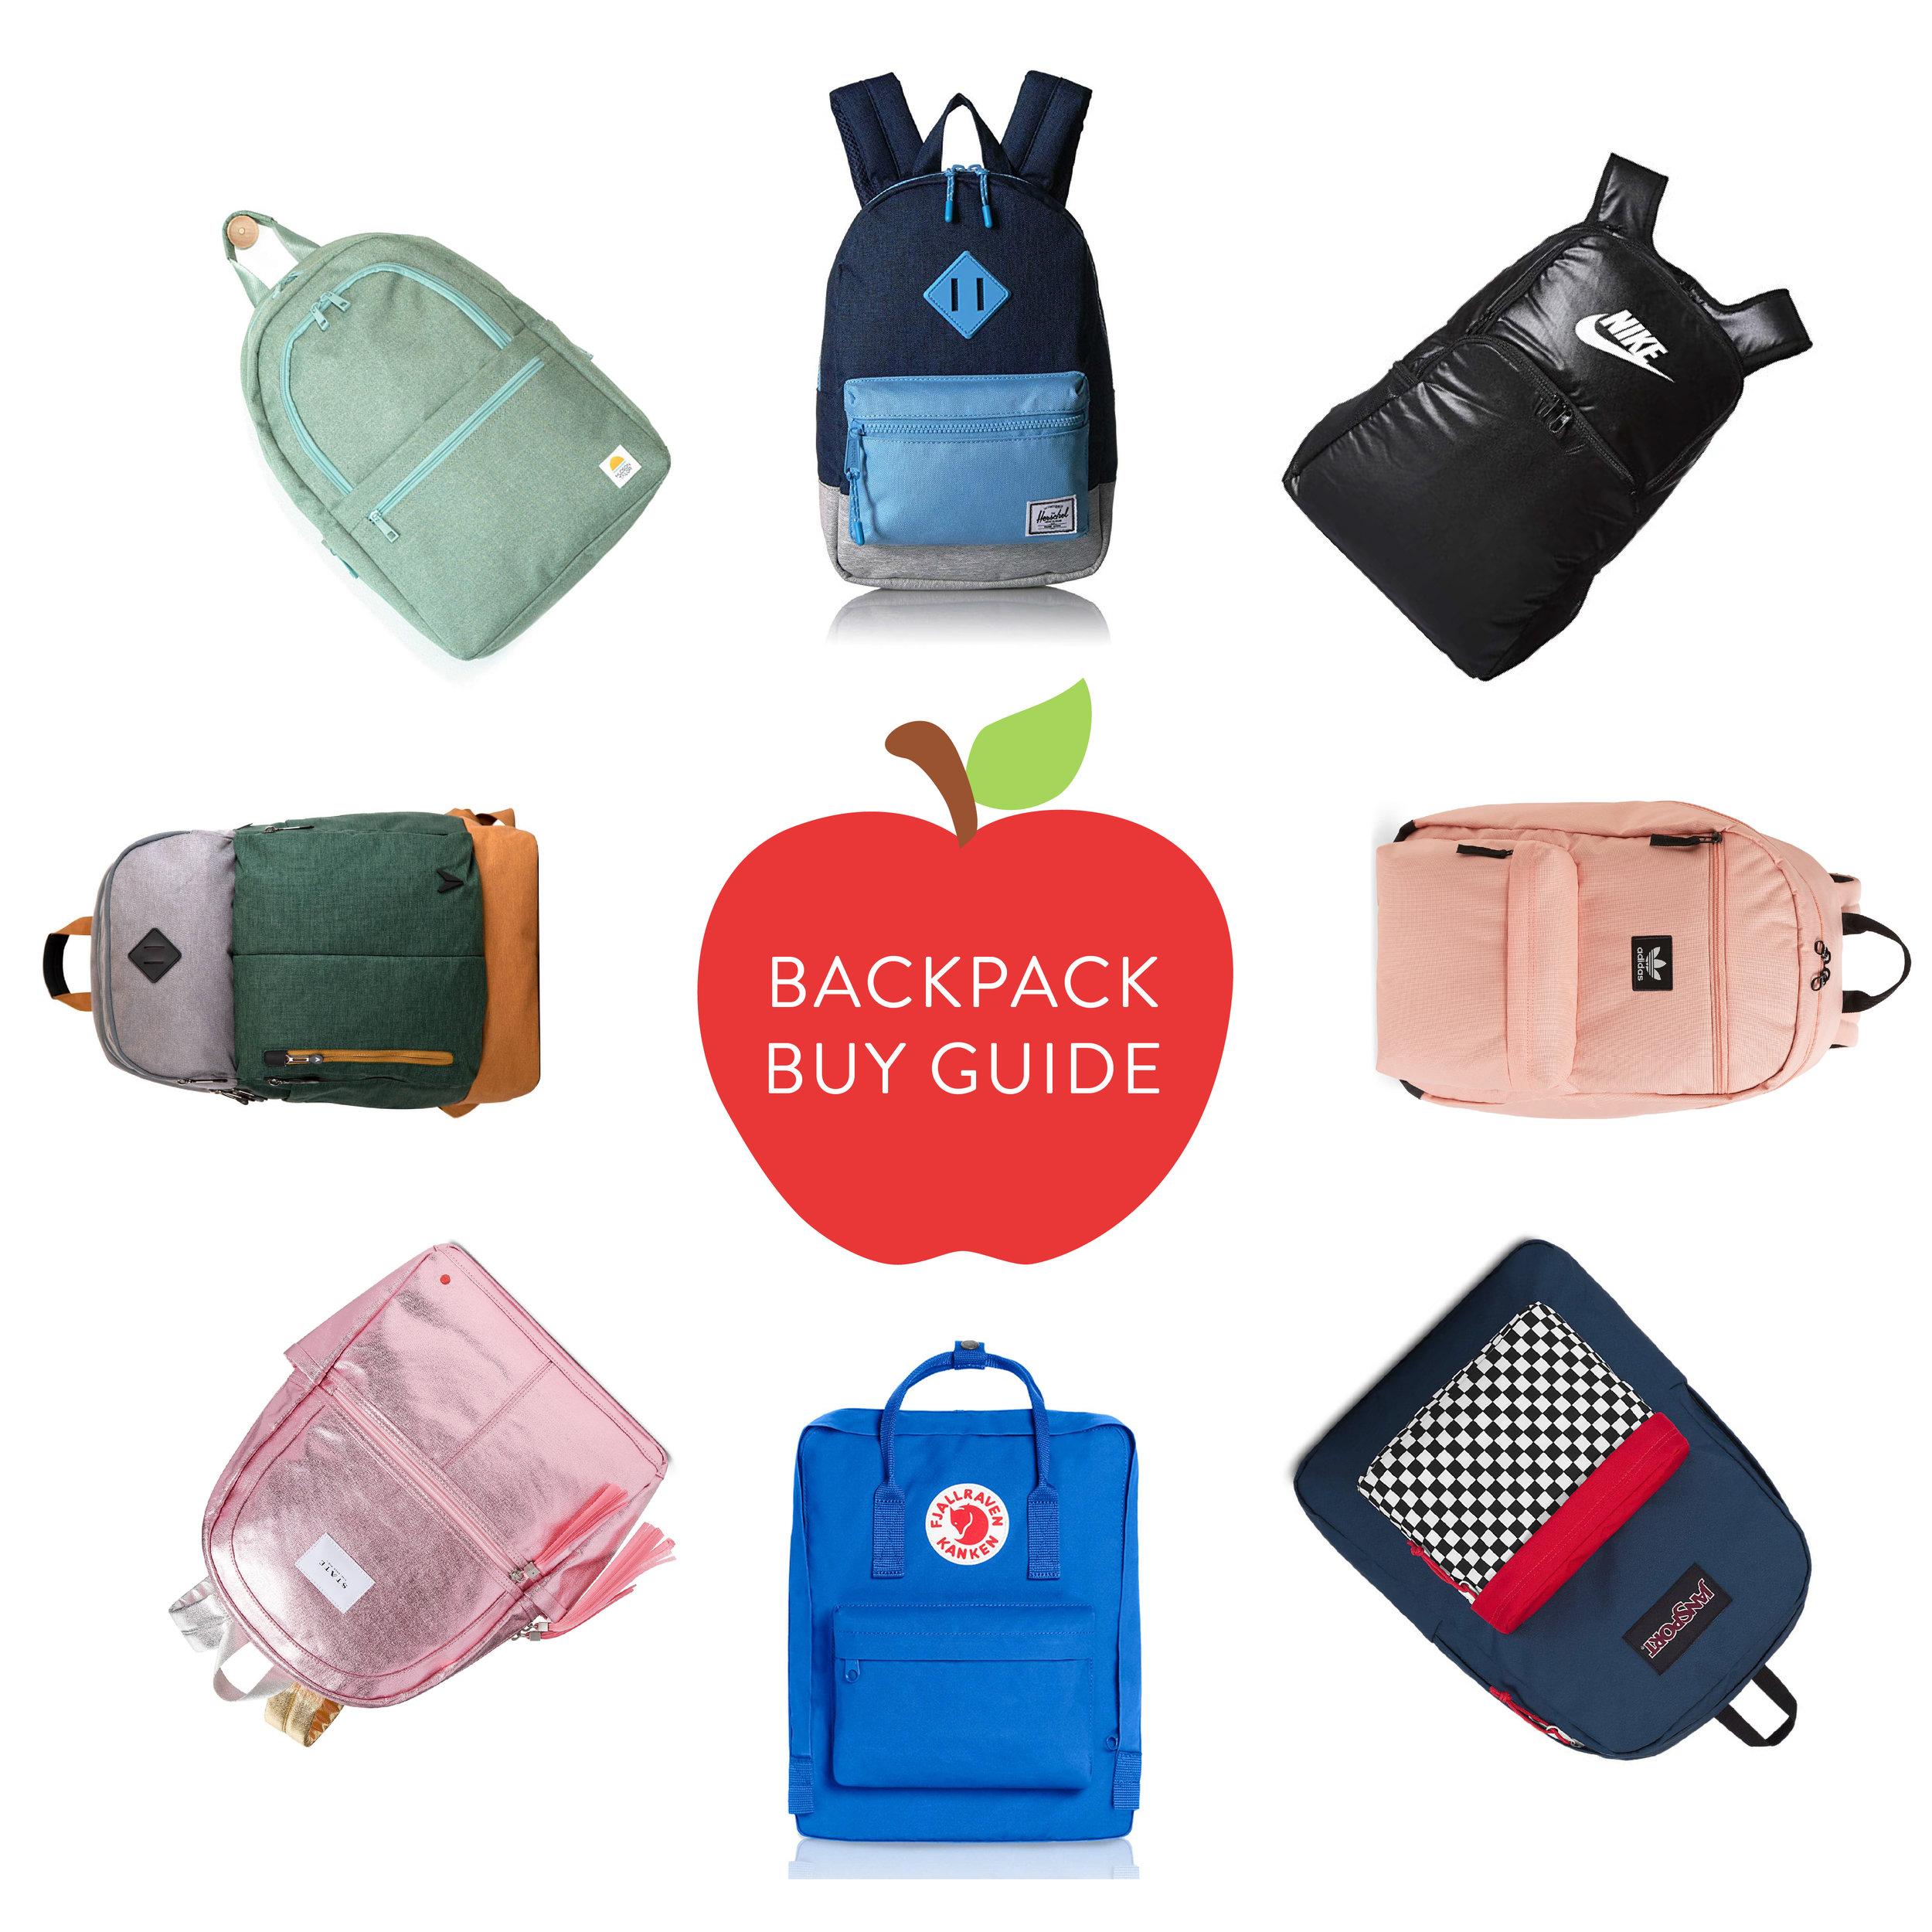 backpackbuyguide-04.jpg